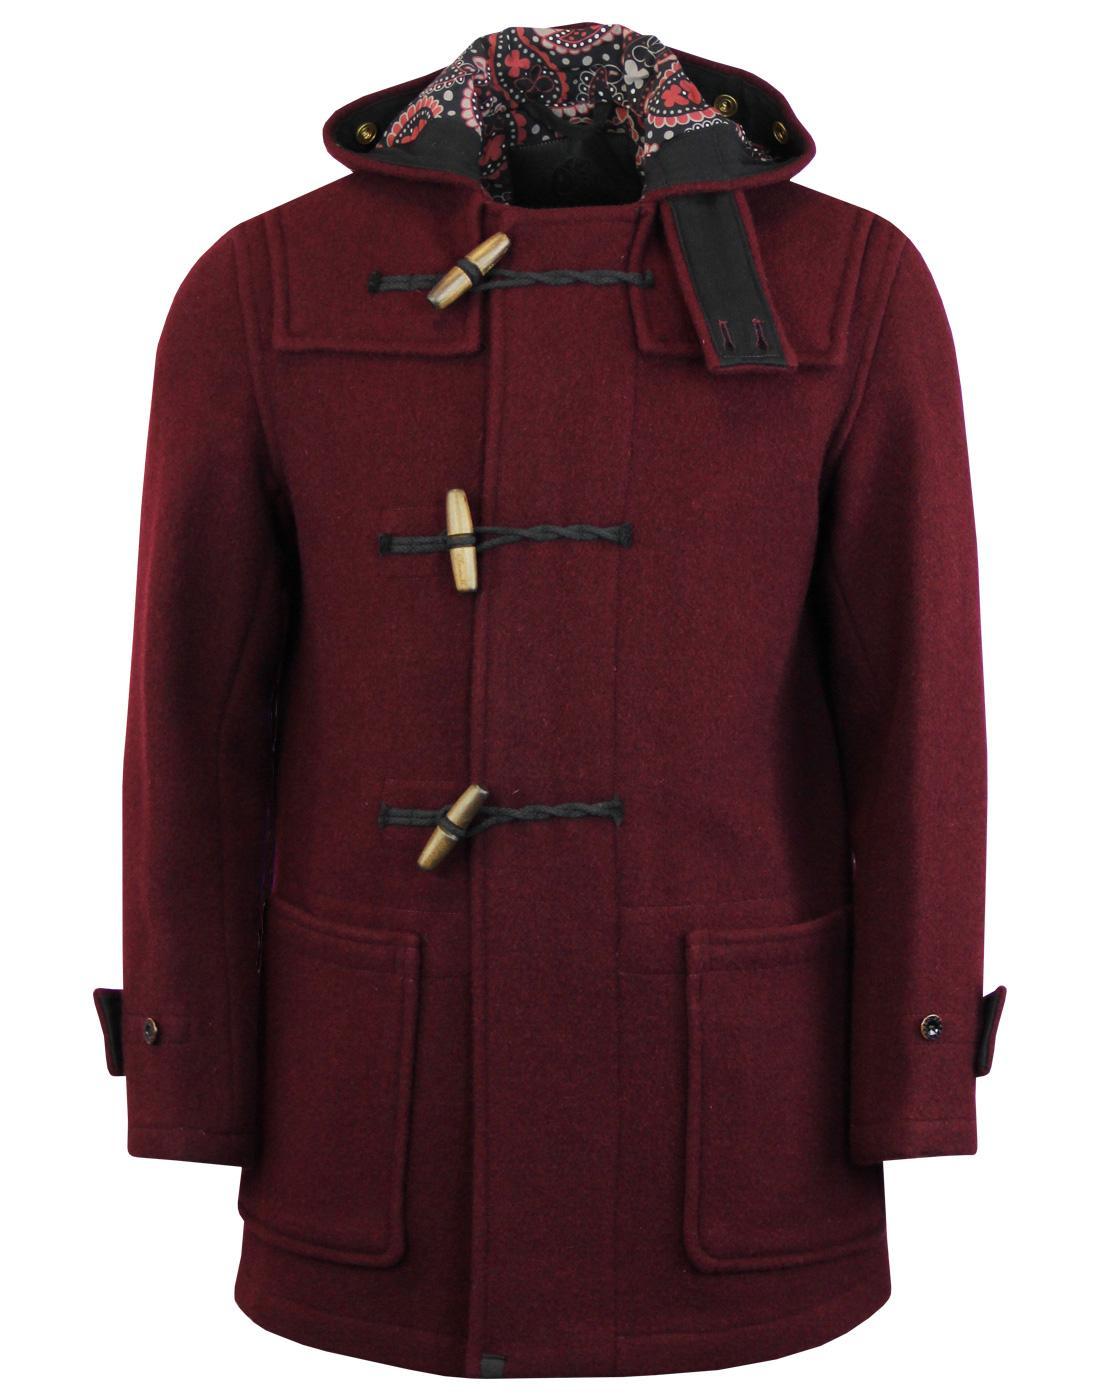 cd6651d5b GLOVERALL PRETTY GREEN Monty Barrett Made in England Duffle Coat